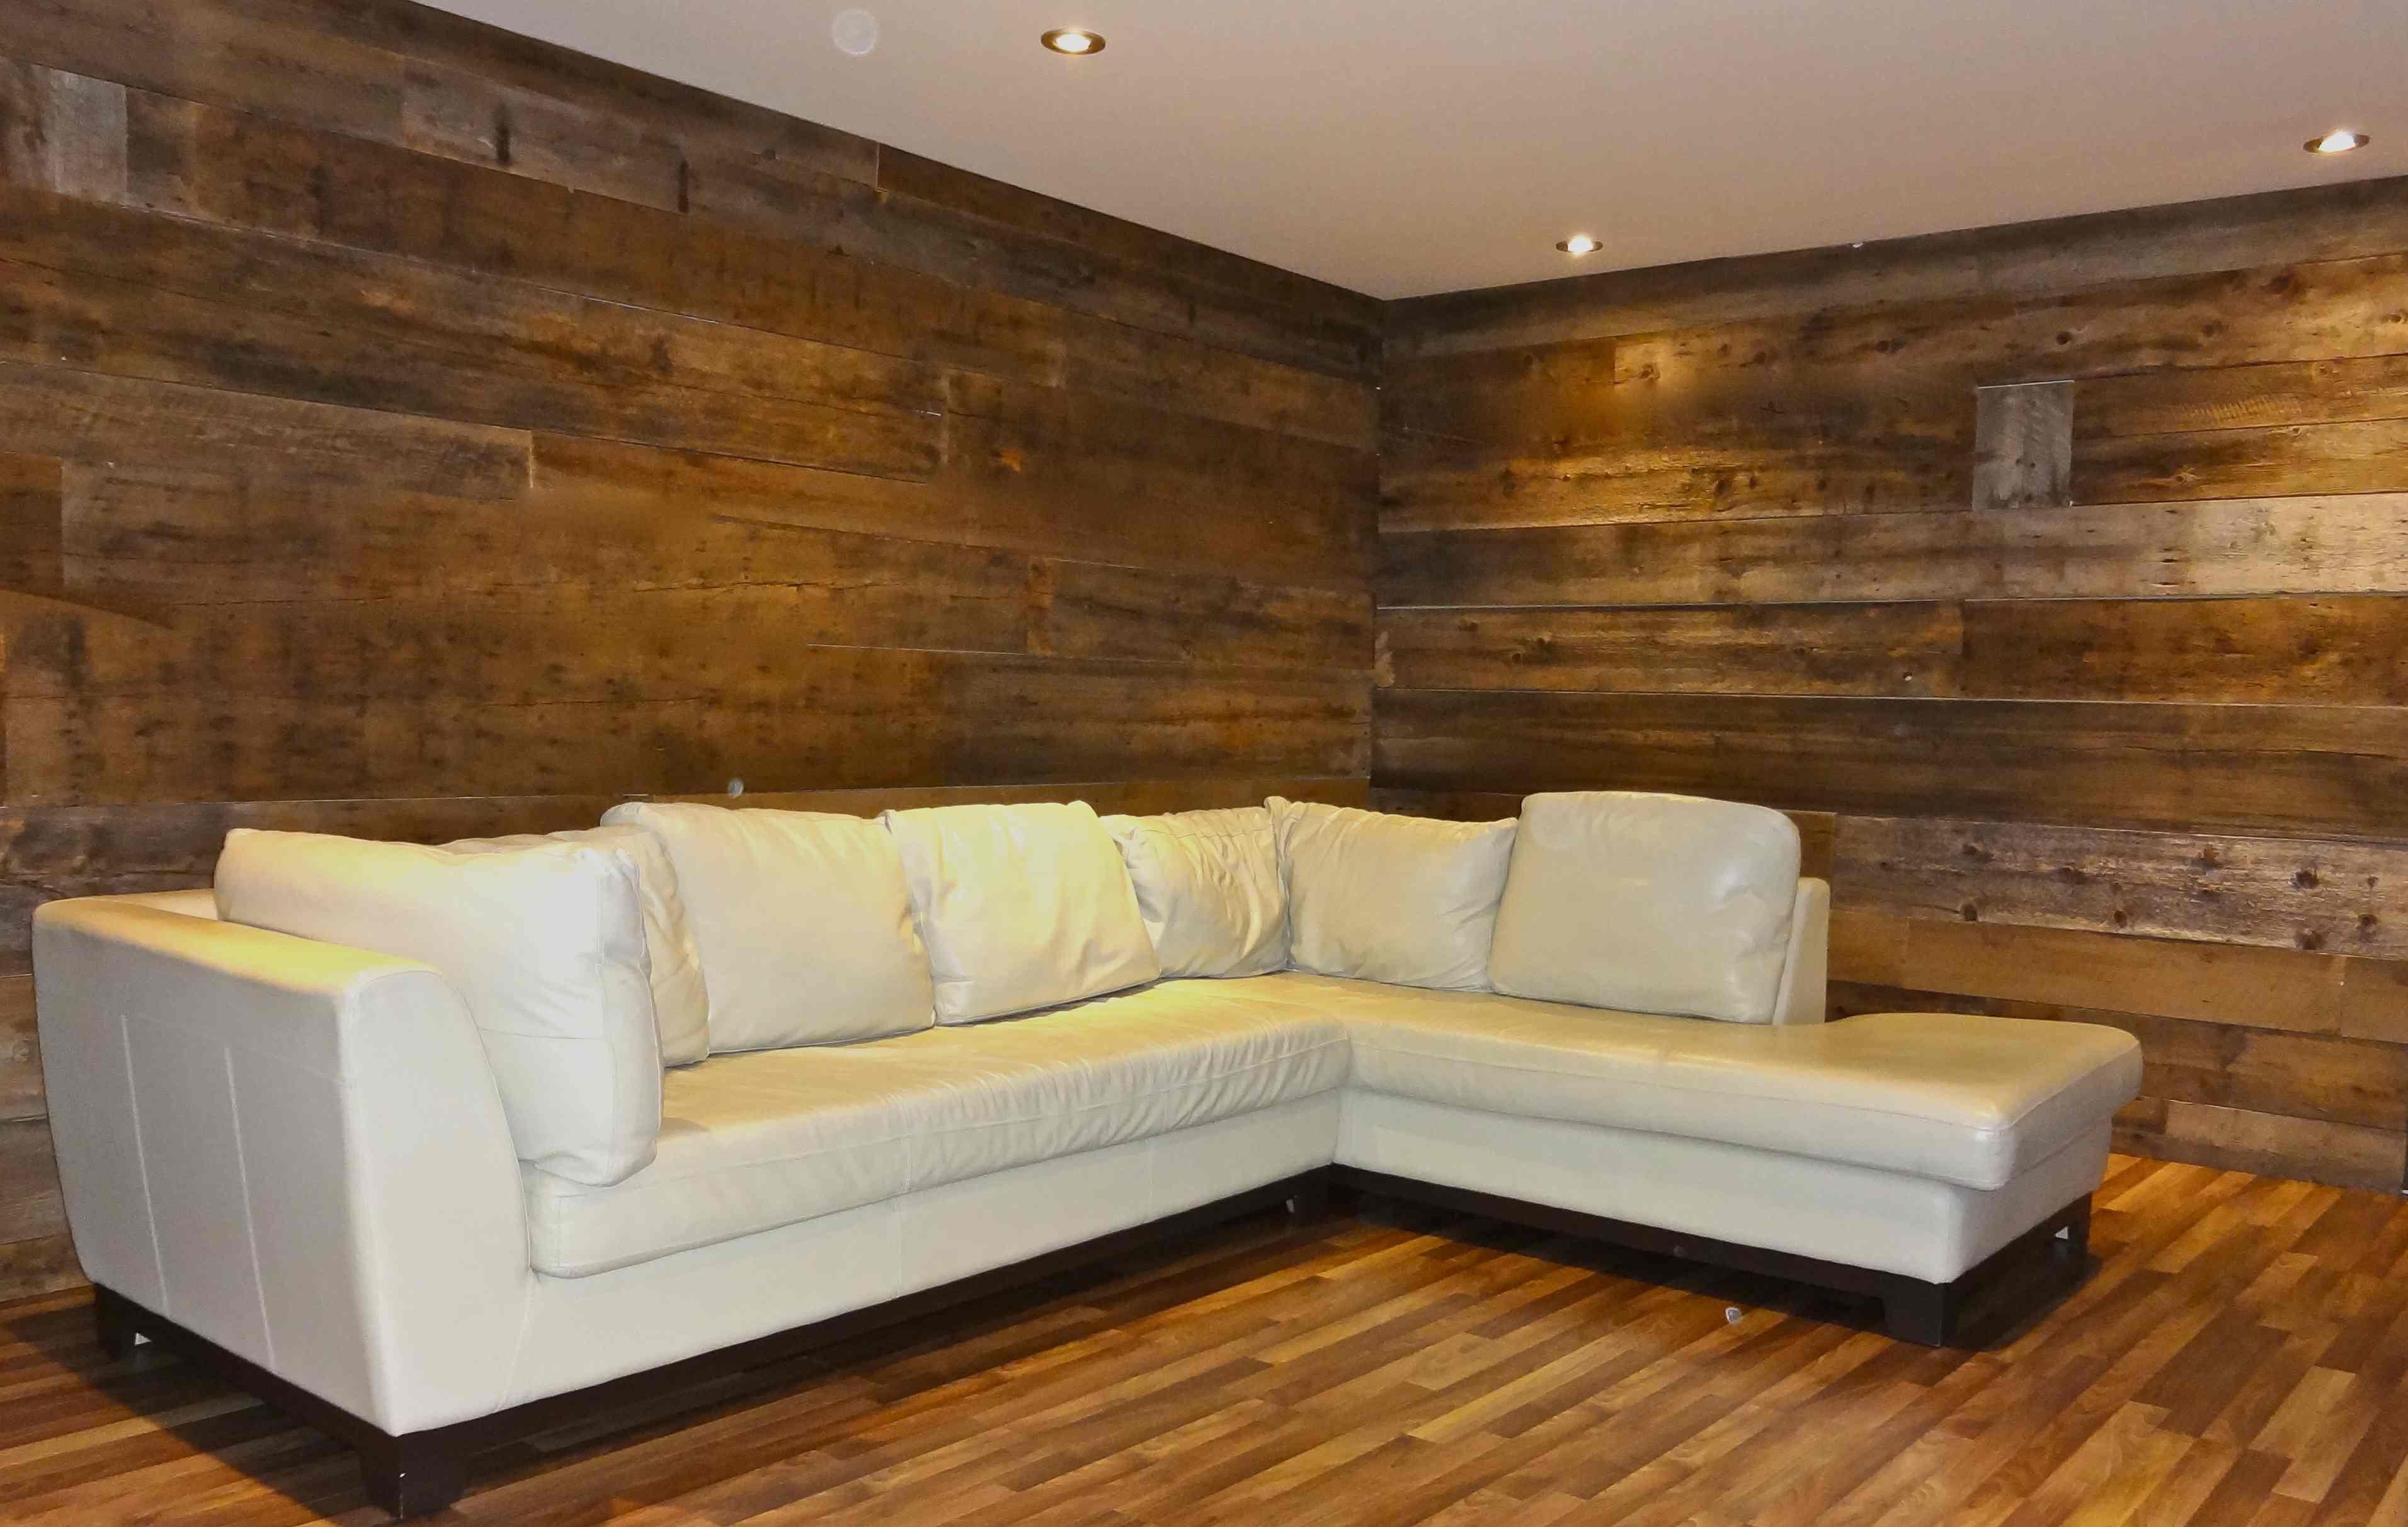 pin by danielle pelletier on reclaimed wood wall pinterest. Black Bedroom Furniture Sets. Home Design Ideas